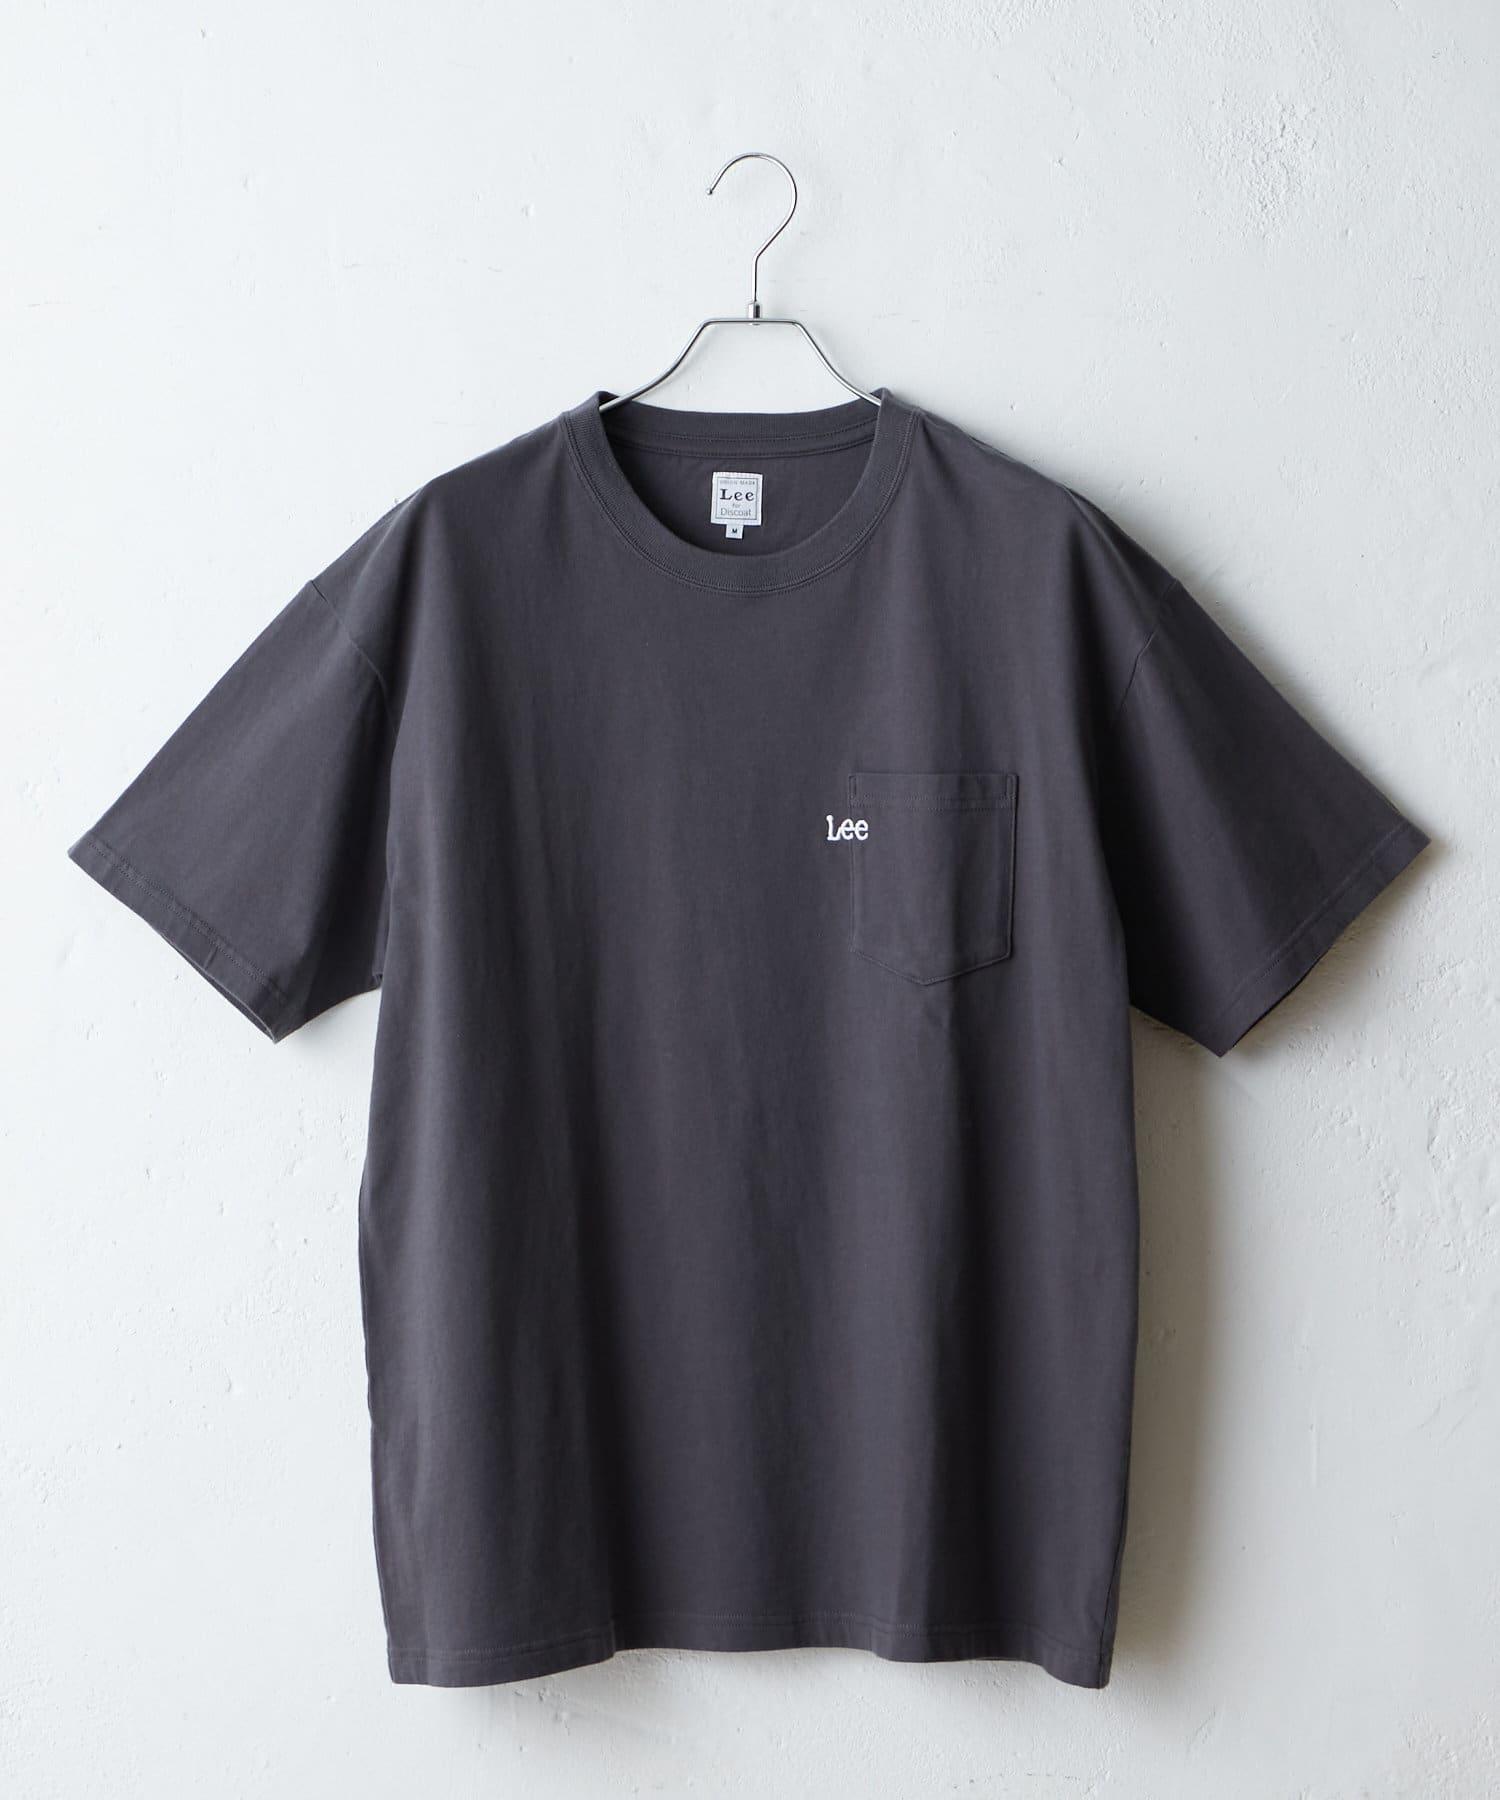 Discoat(ディスコート) 【Lee/リー】コラボポケ付刺繍バックプリントT